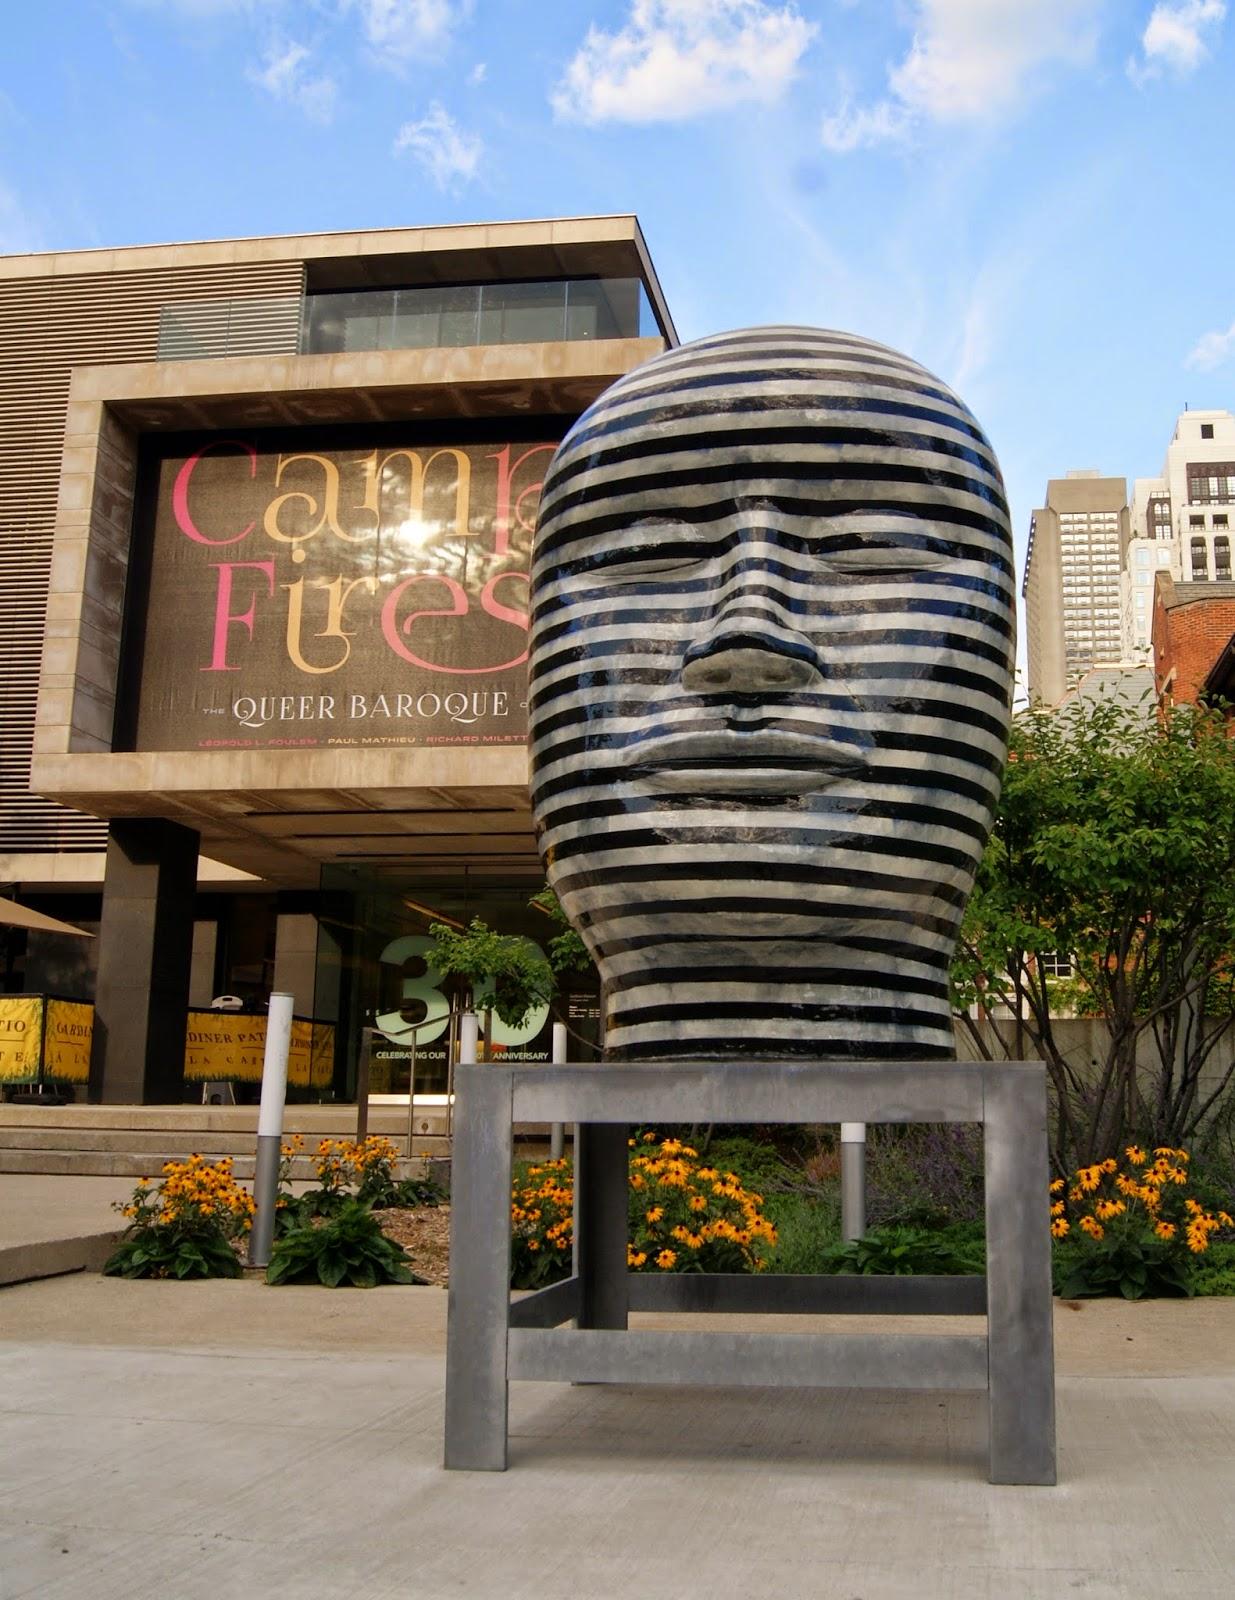 Gardiner Museum of Ceramic Art in Toronto and Untitled sculpture by Jun Kaneko, Toronto, Artmatters, Culture, Ontario, Canada, MelaniePs, The Purple Scarf, Camp Fires, Exhibit, Exhibition